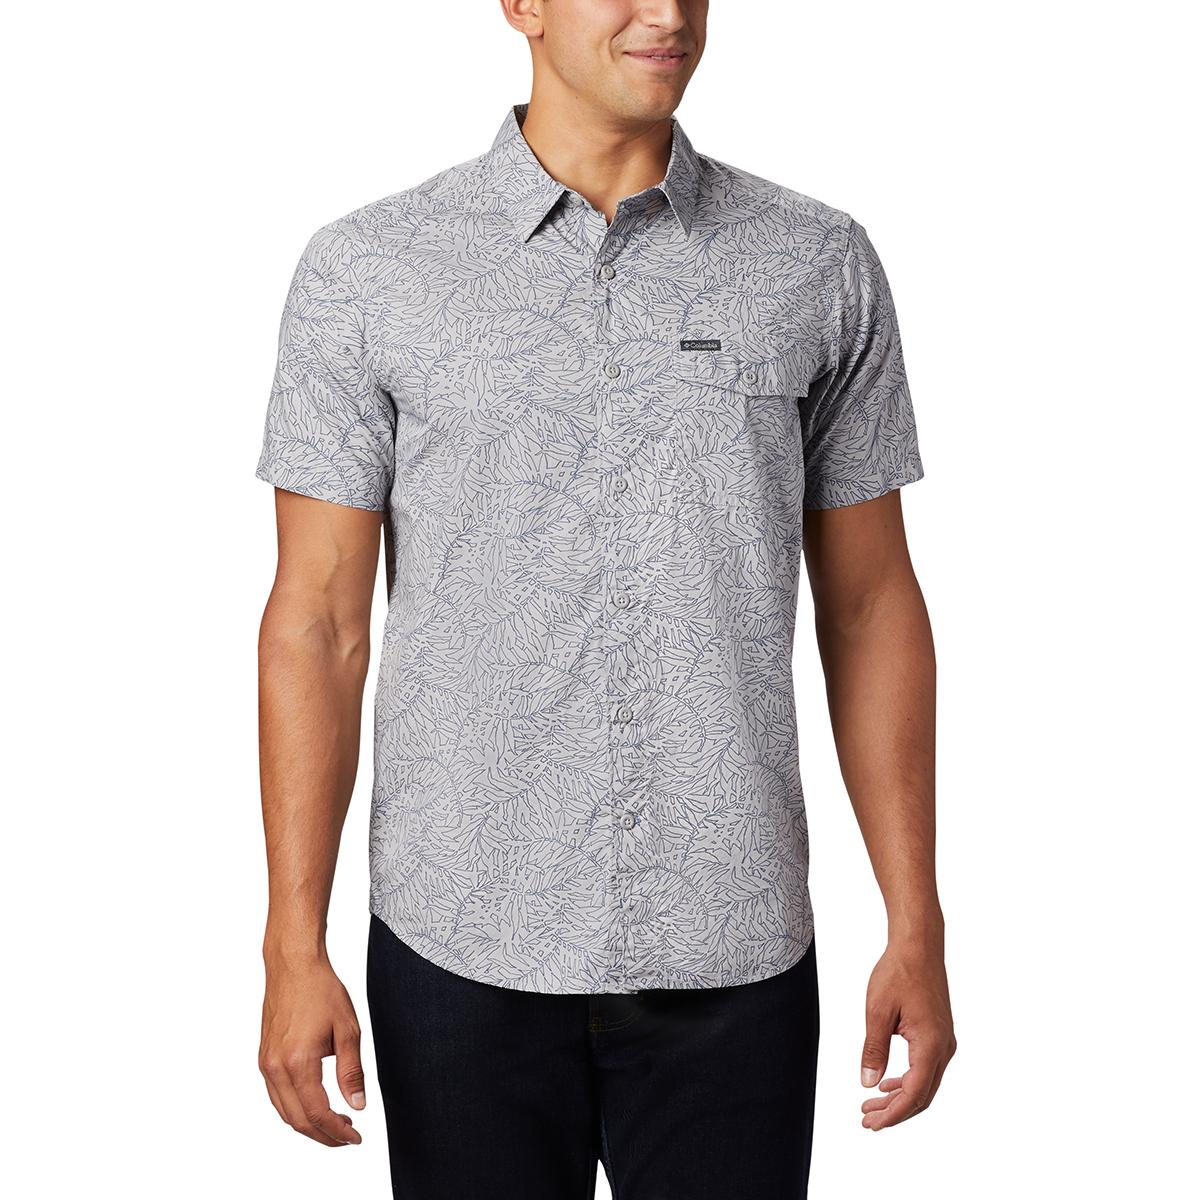 Columbia Men's Summer Chill Short-Sleeve Shirt - Black, XL